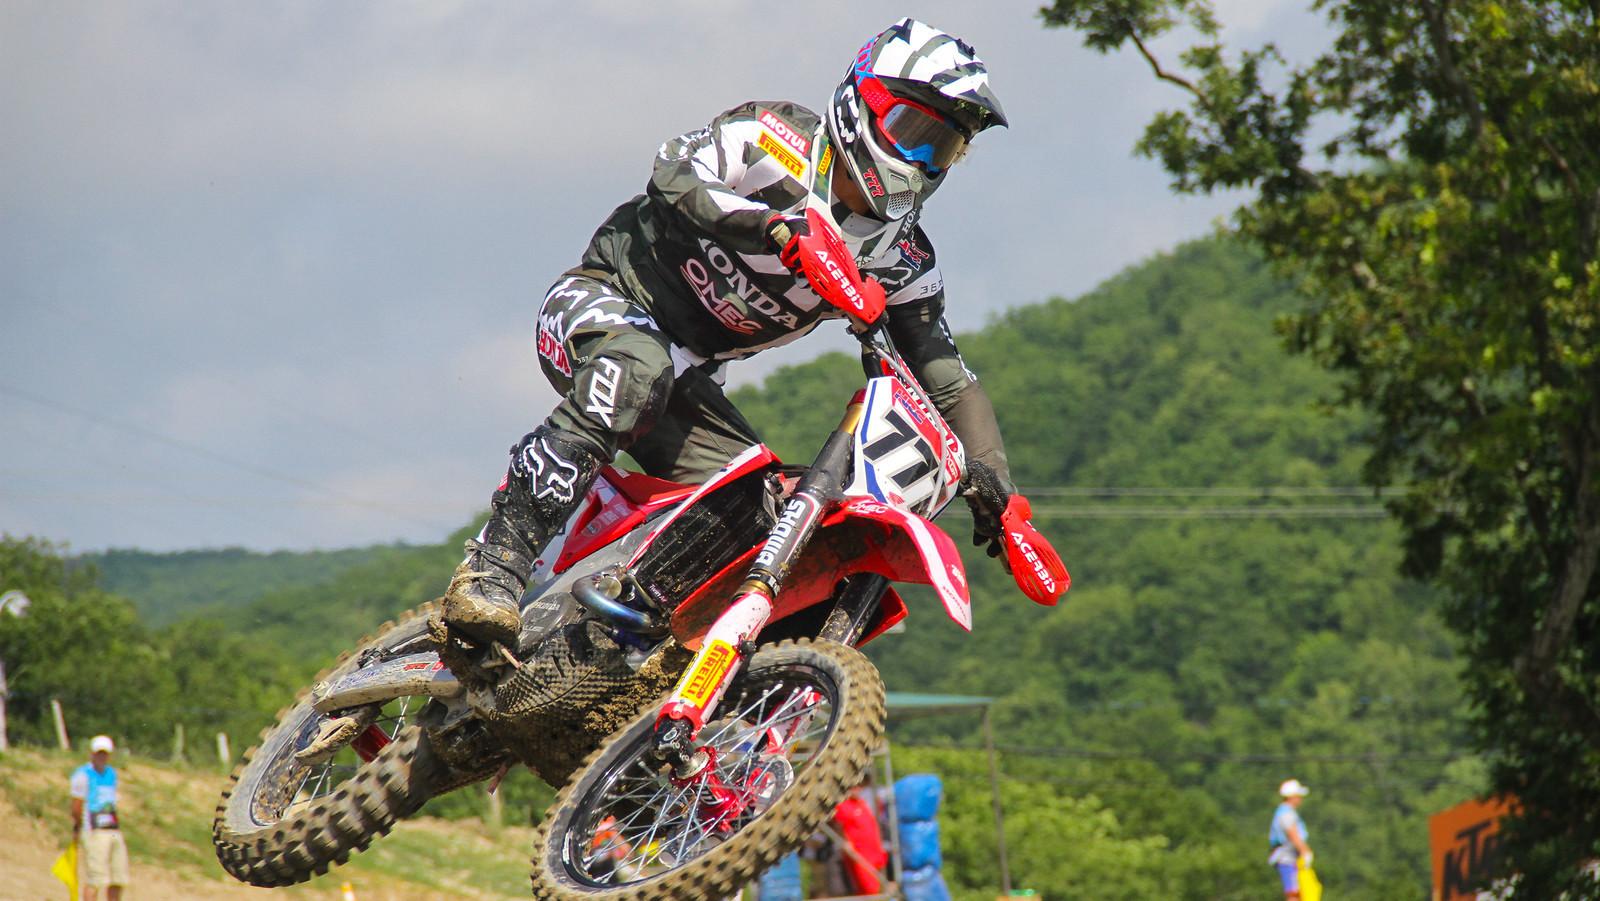 Evgeny Bobryshev Replaces Benoit Paturel at BOS MXGP - Racing Suzuki in MXGP and British Series